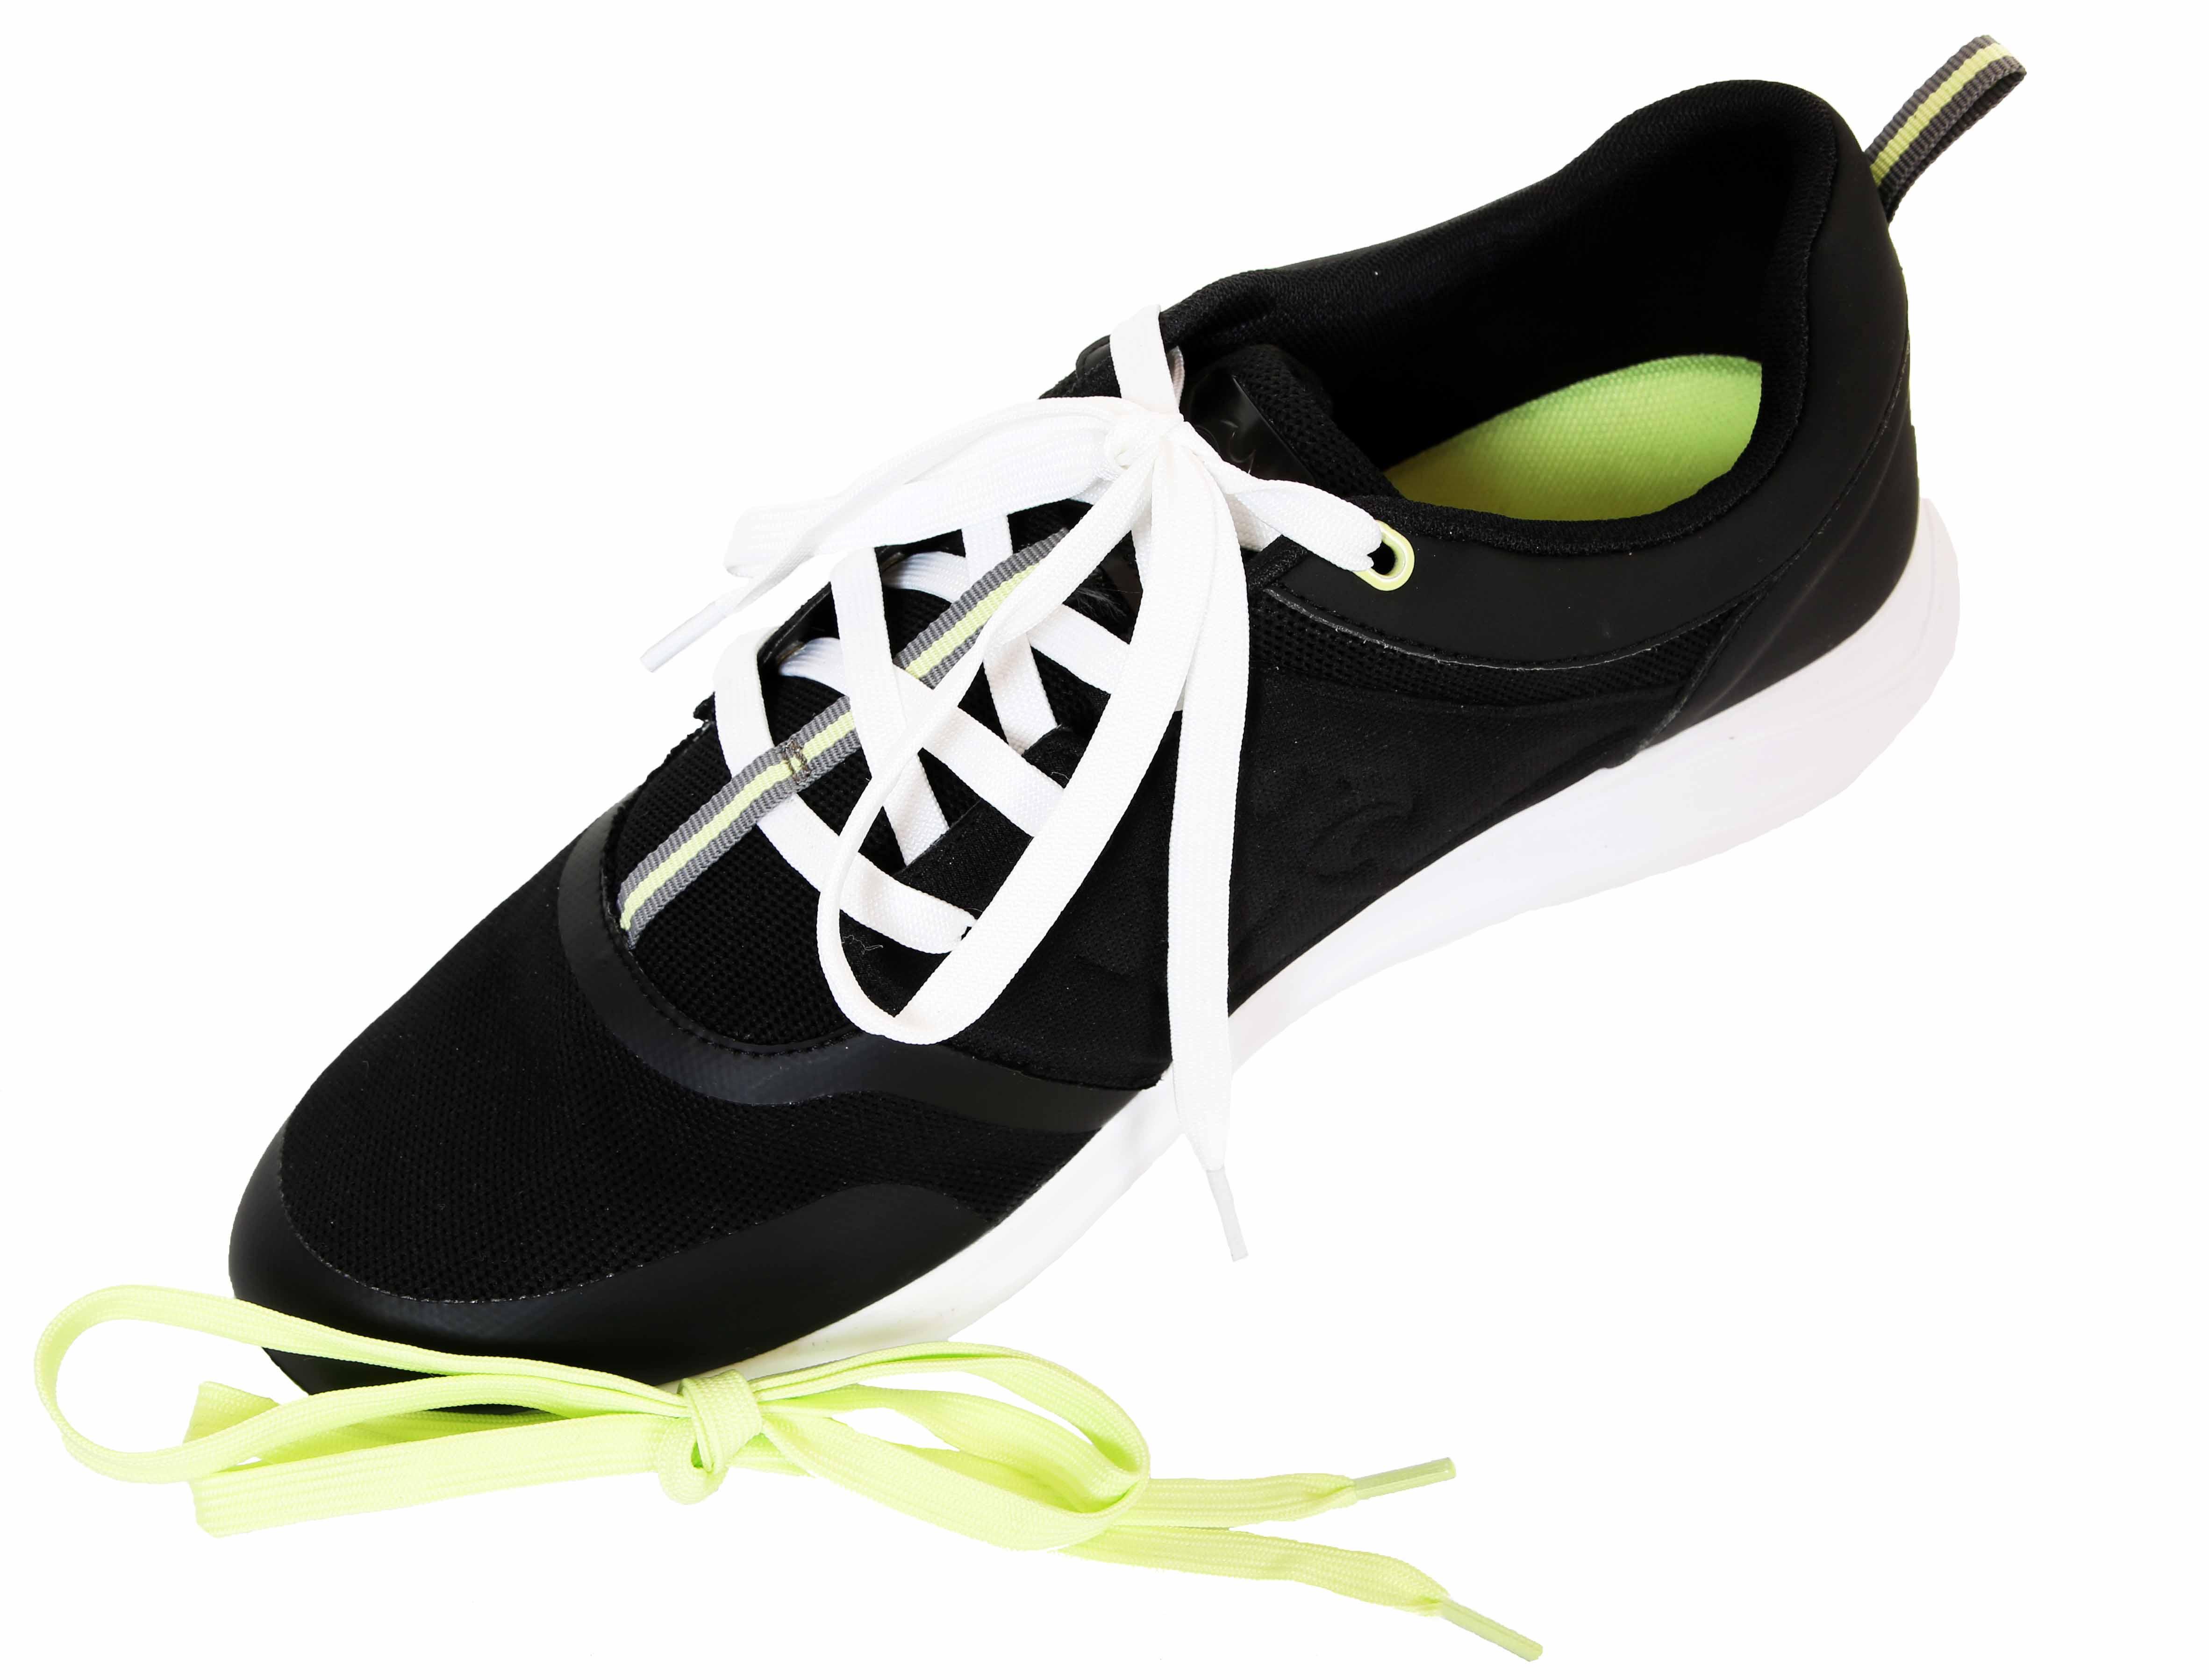 Henselite Mens HM74 Lightweight Lawn Bowls Shoes White//Maroon